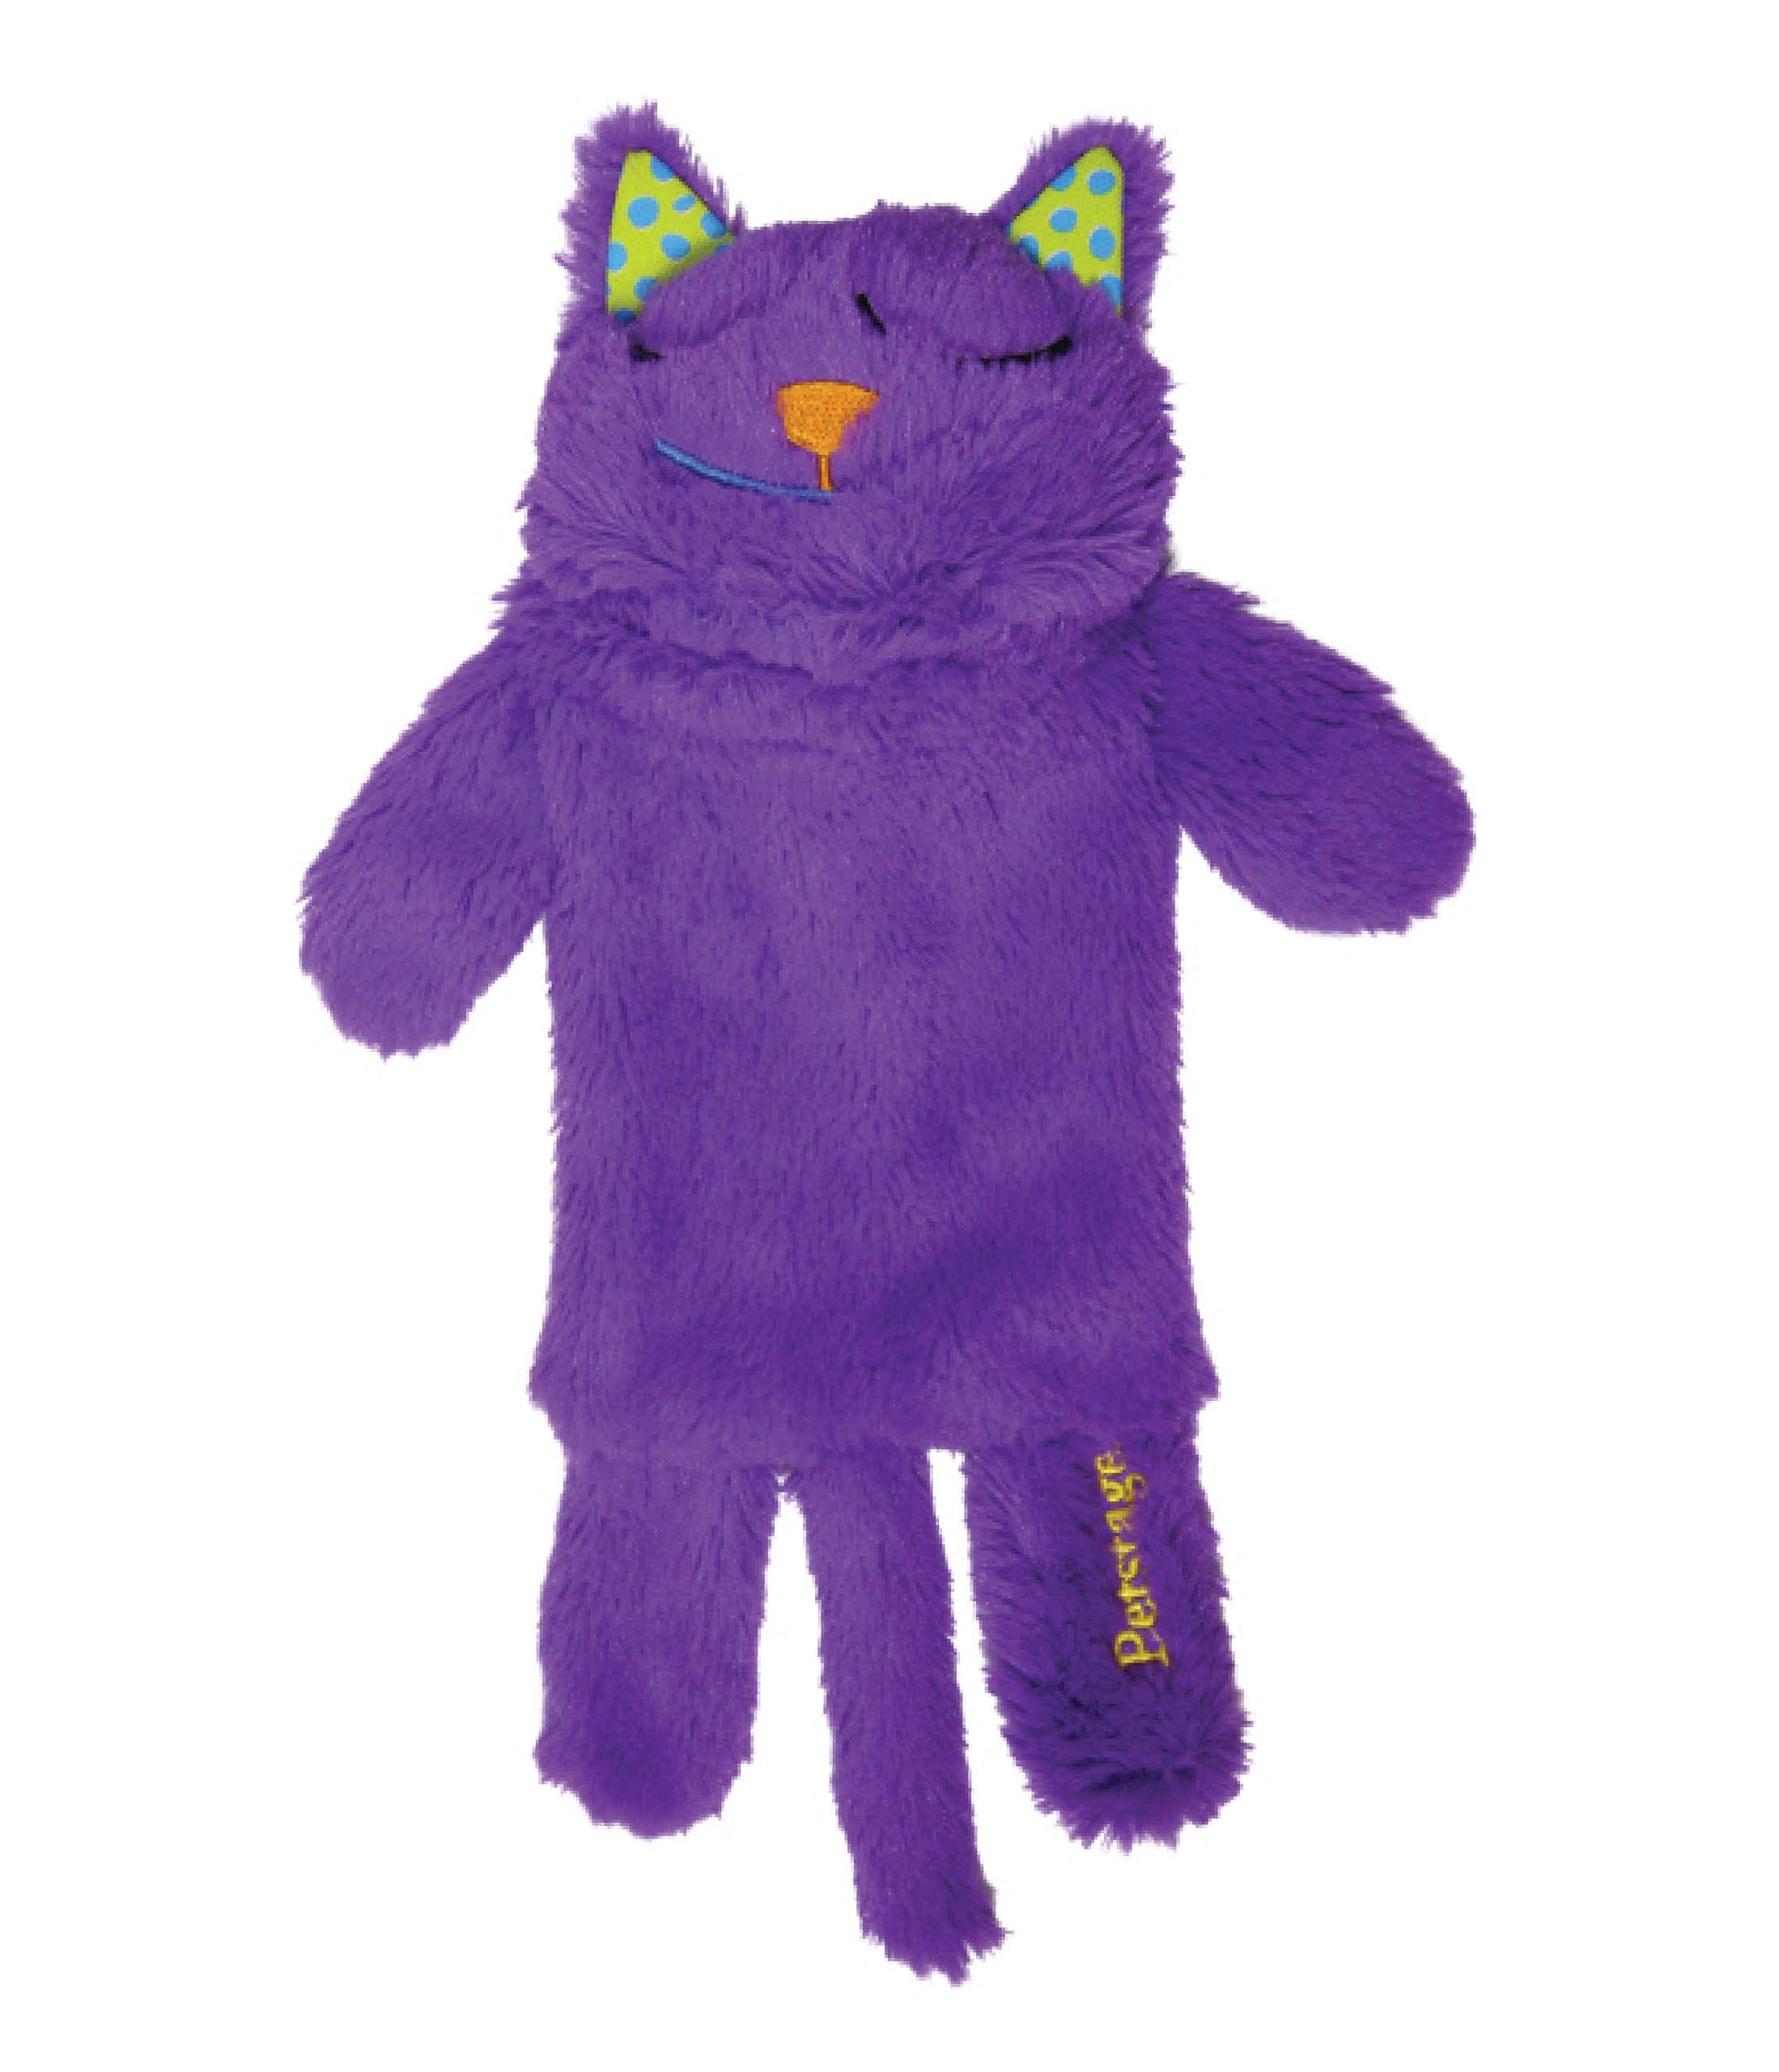 Best kitten teething toys Petstages Cat Cuddle Toys